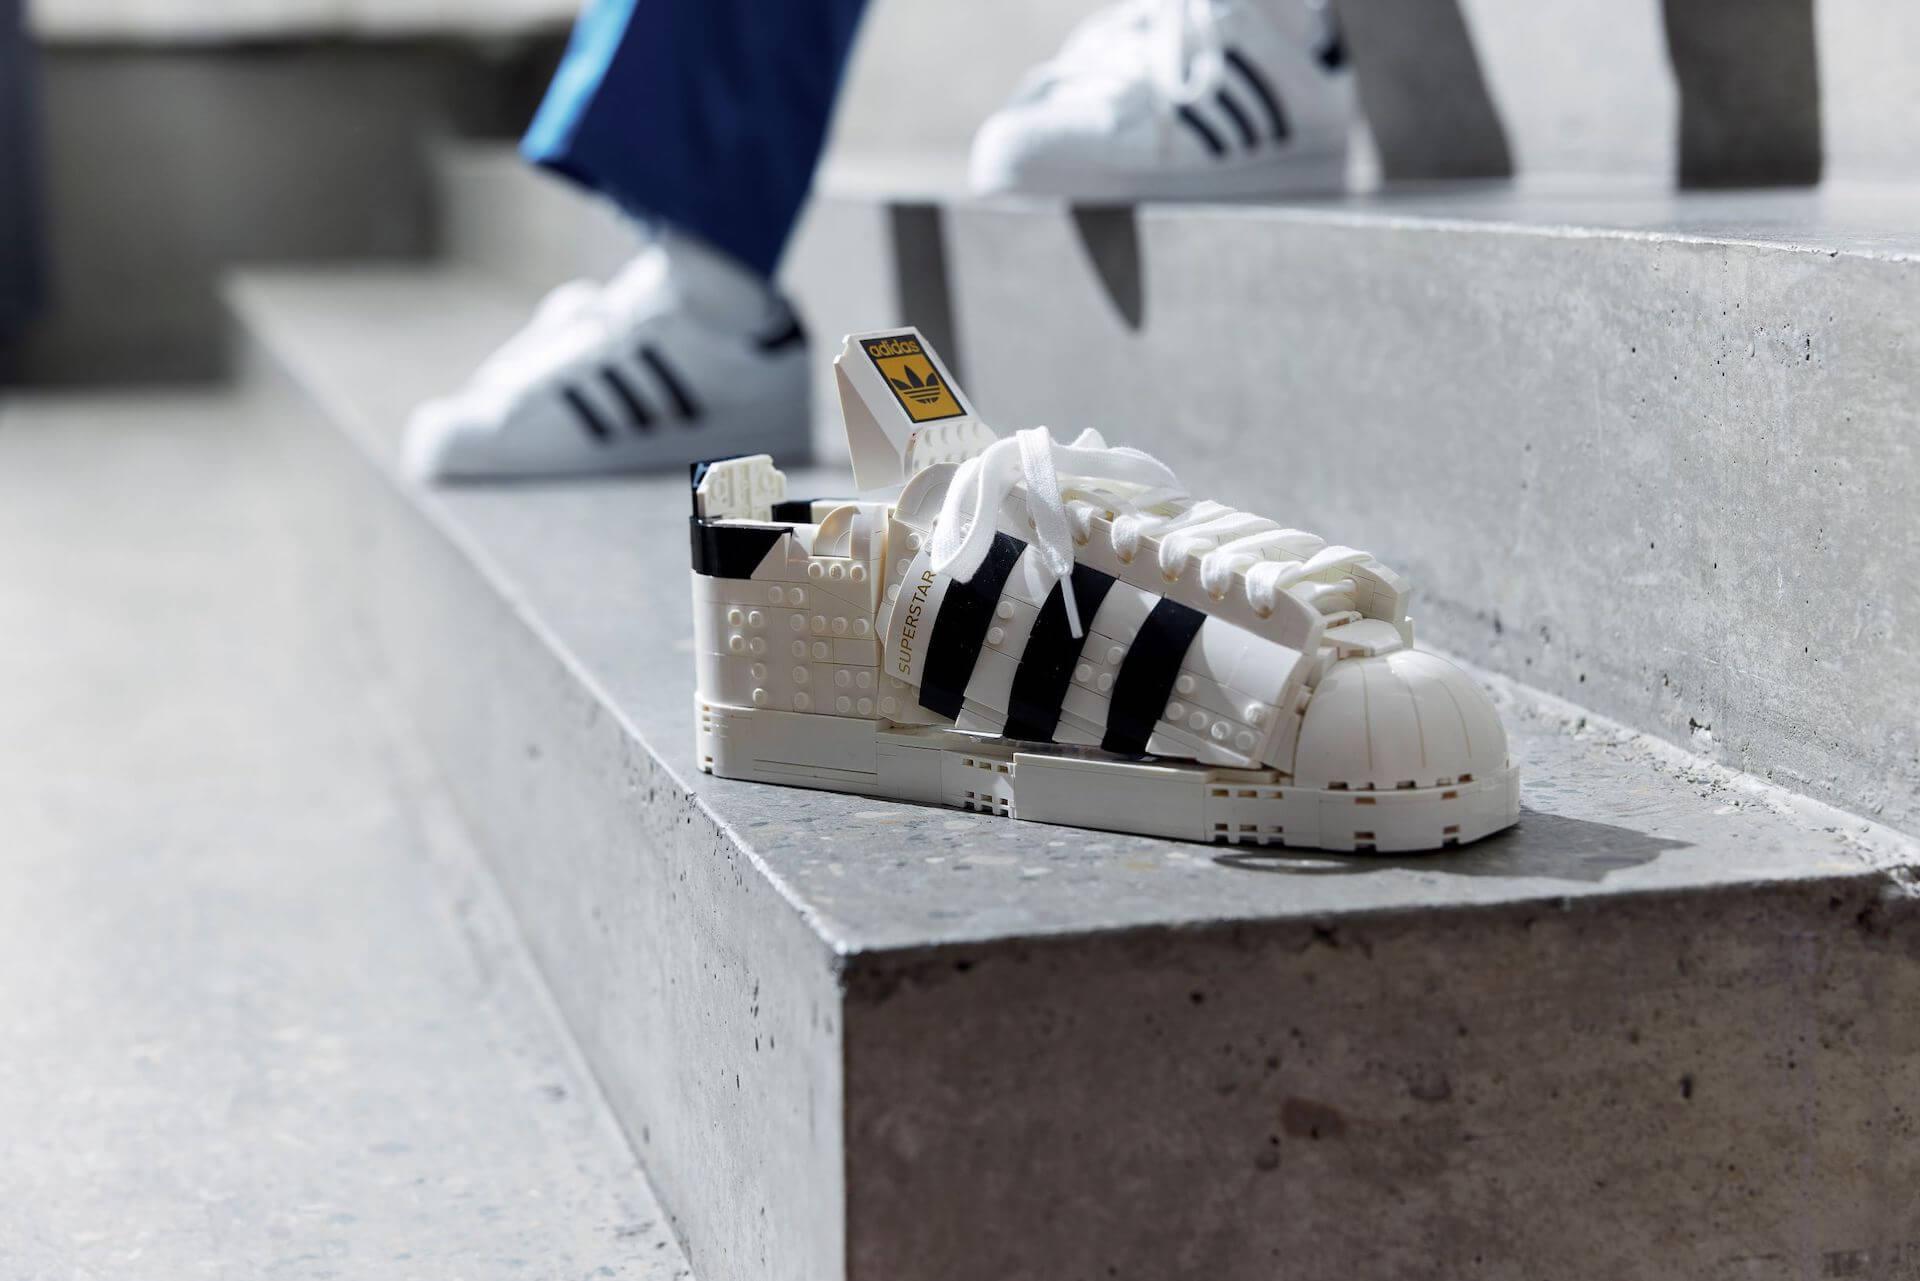 adidas Originalsとレゴのコラボアイテム「レゴ アディダス オリジナルス スーパースター」が発売決定! life210615_adidasoriginals_lego_1